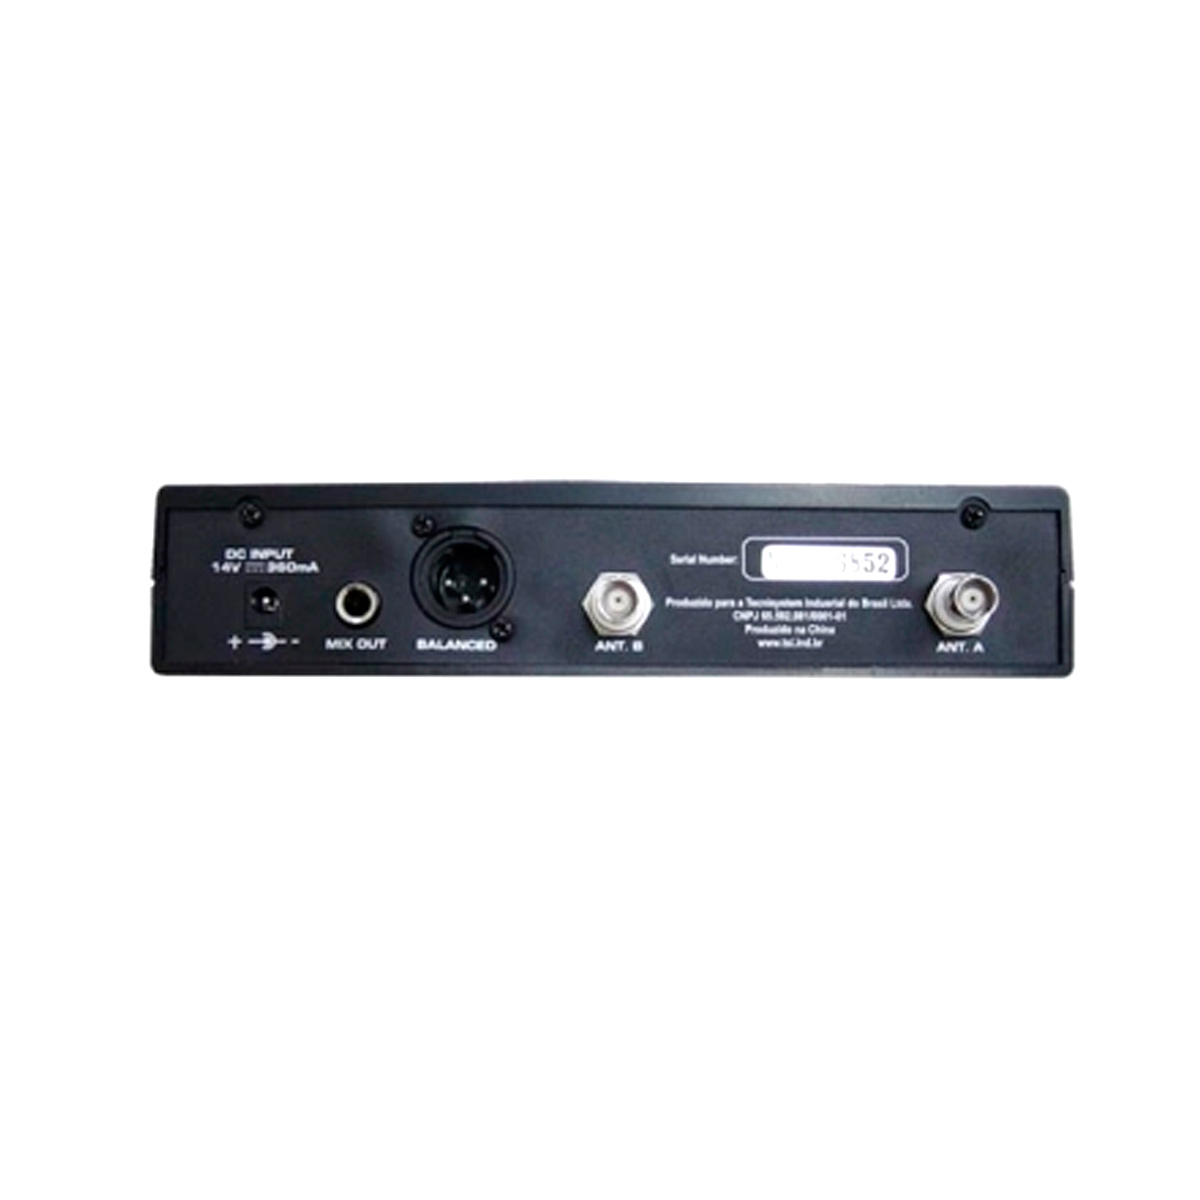 MICROFONE S/ FIO DE MÃO UHF 8099 - TSI